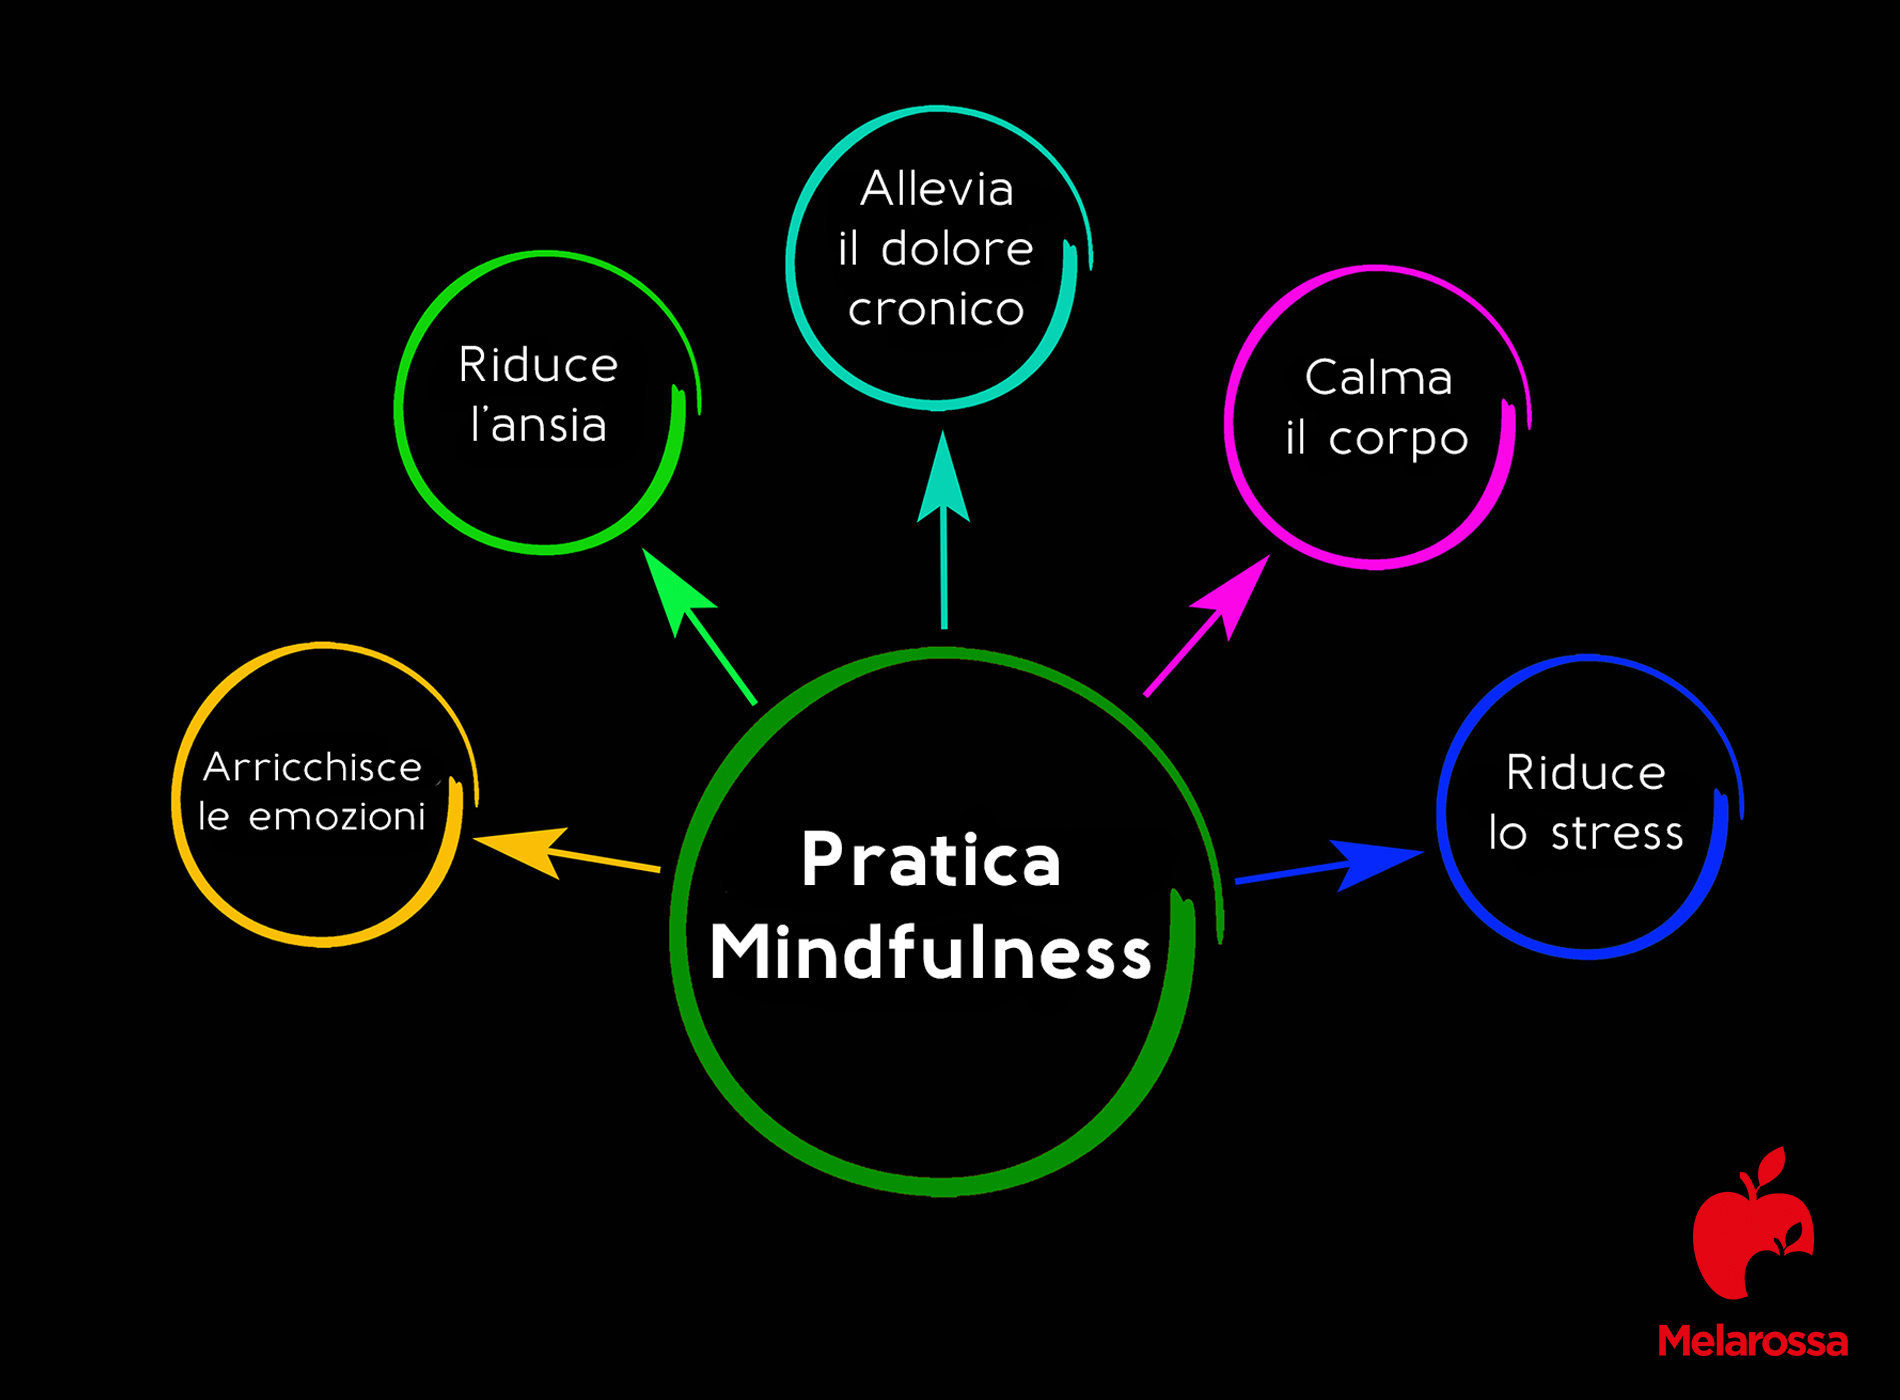 dermatite da stress: mindfulness